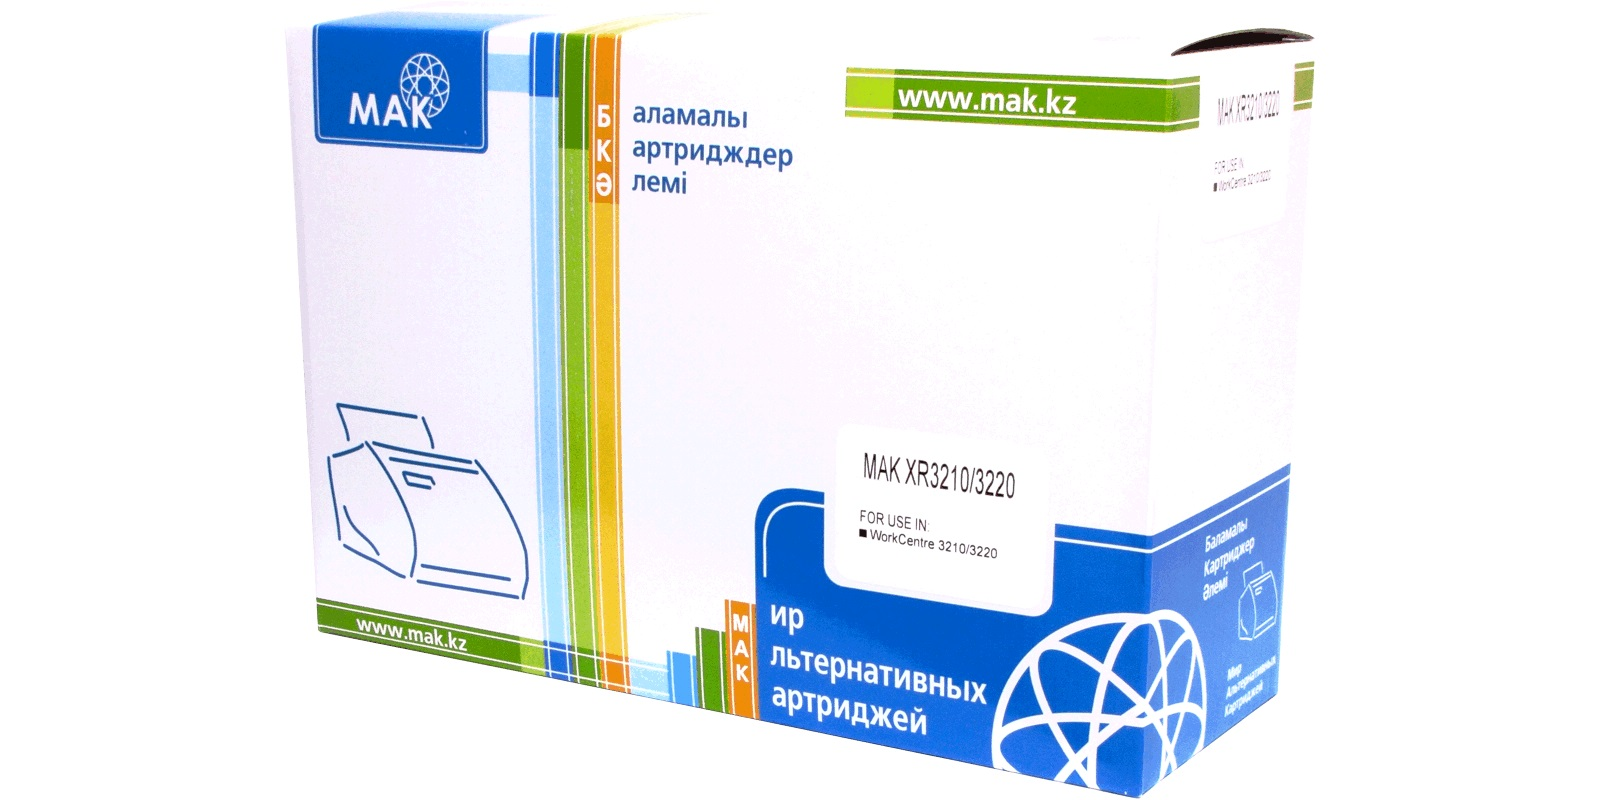 Картридж лазерный MAK© WC3210/3220 (106R01487) черный (black), до 4100 стр, для Xerox